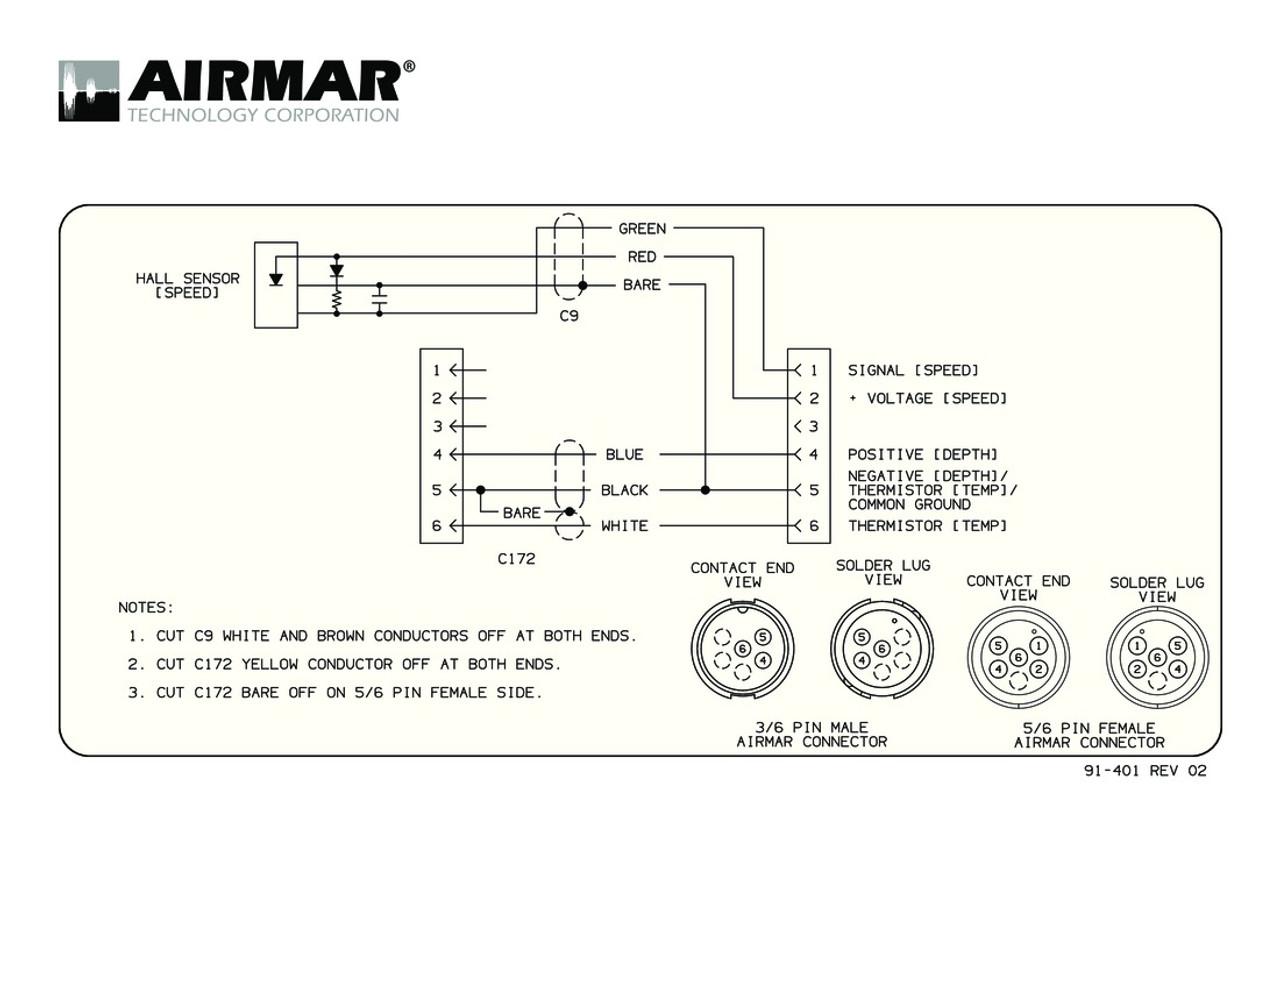 Garmin Wiring Diagram on data mapping diagram, garmin sensor, atx connector diagram, garmin usb wiring, garmin 3010c wiring, garmin network cable wiring, garmin speedometer,